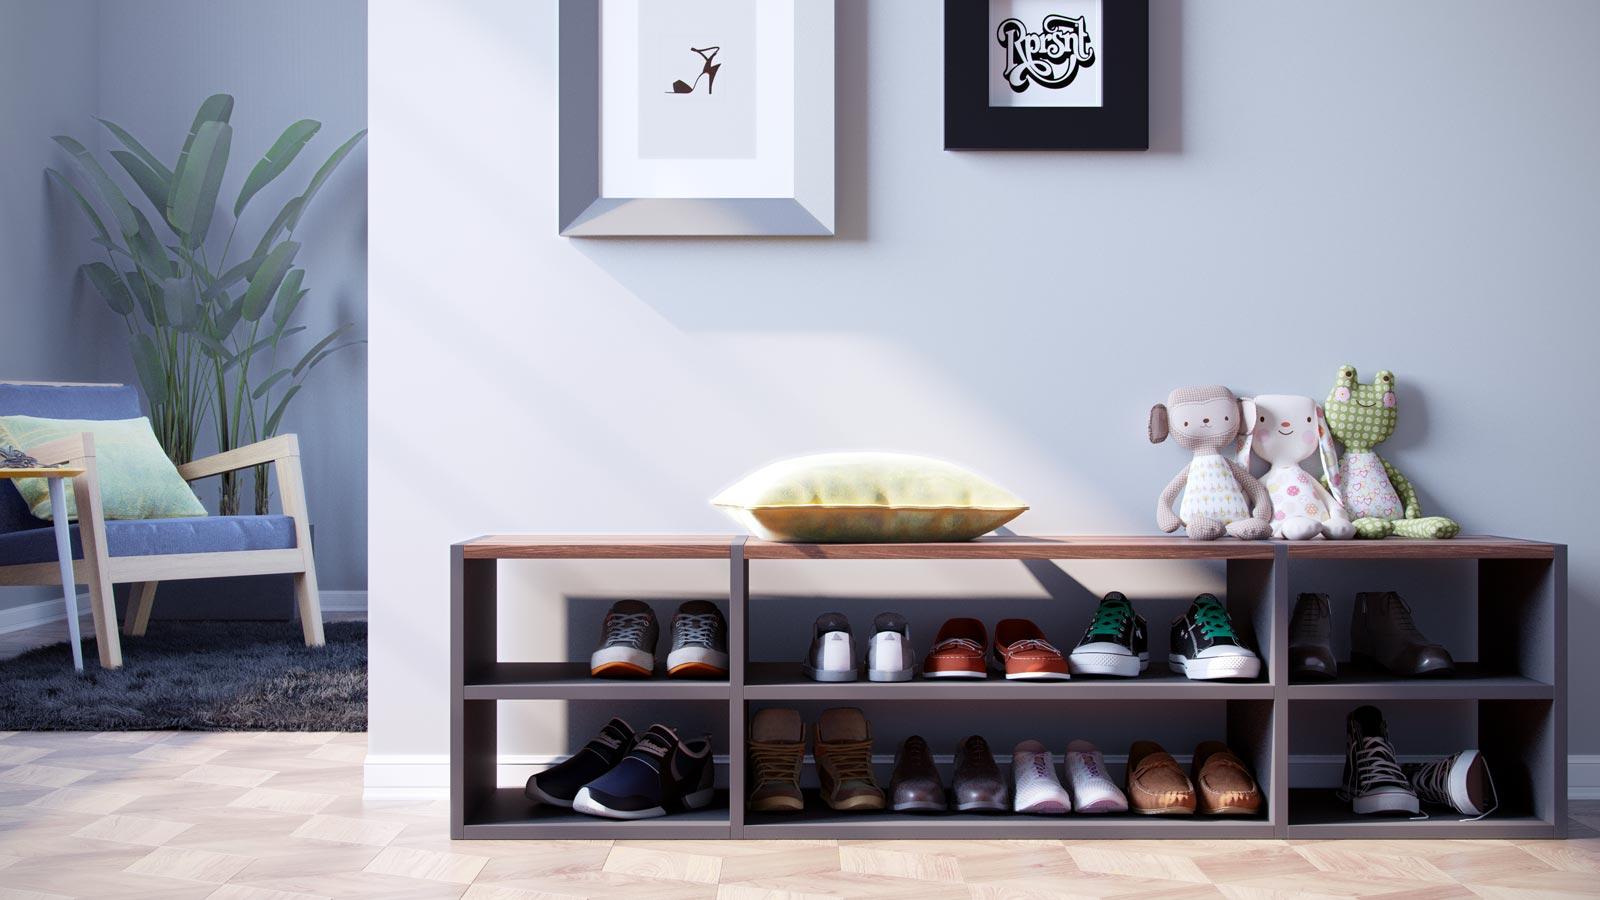 Schuhregal online designen | Schuhregale bei MYCS | MYCS ...